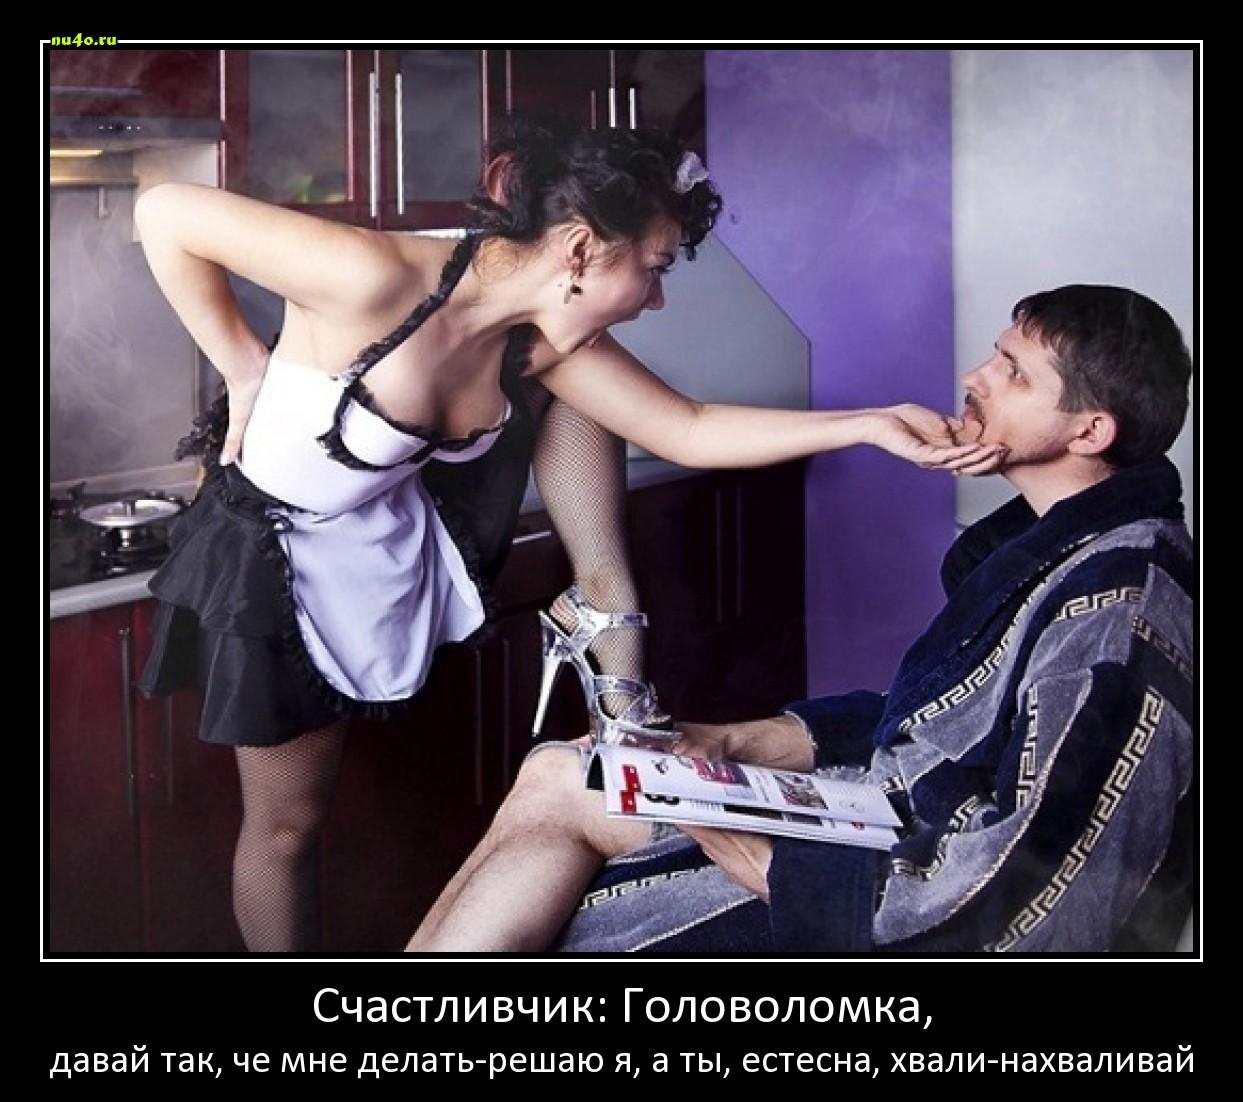 Любовник извращенец